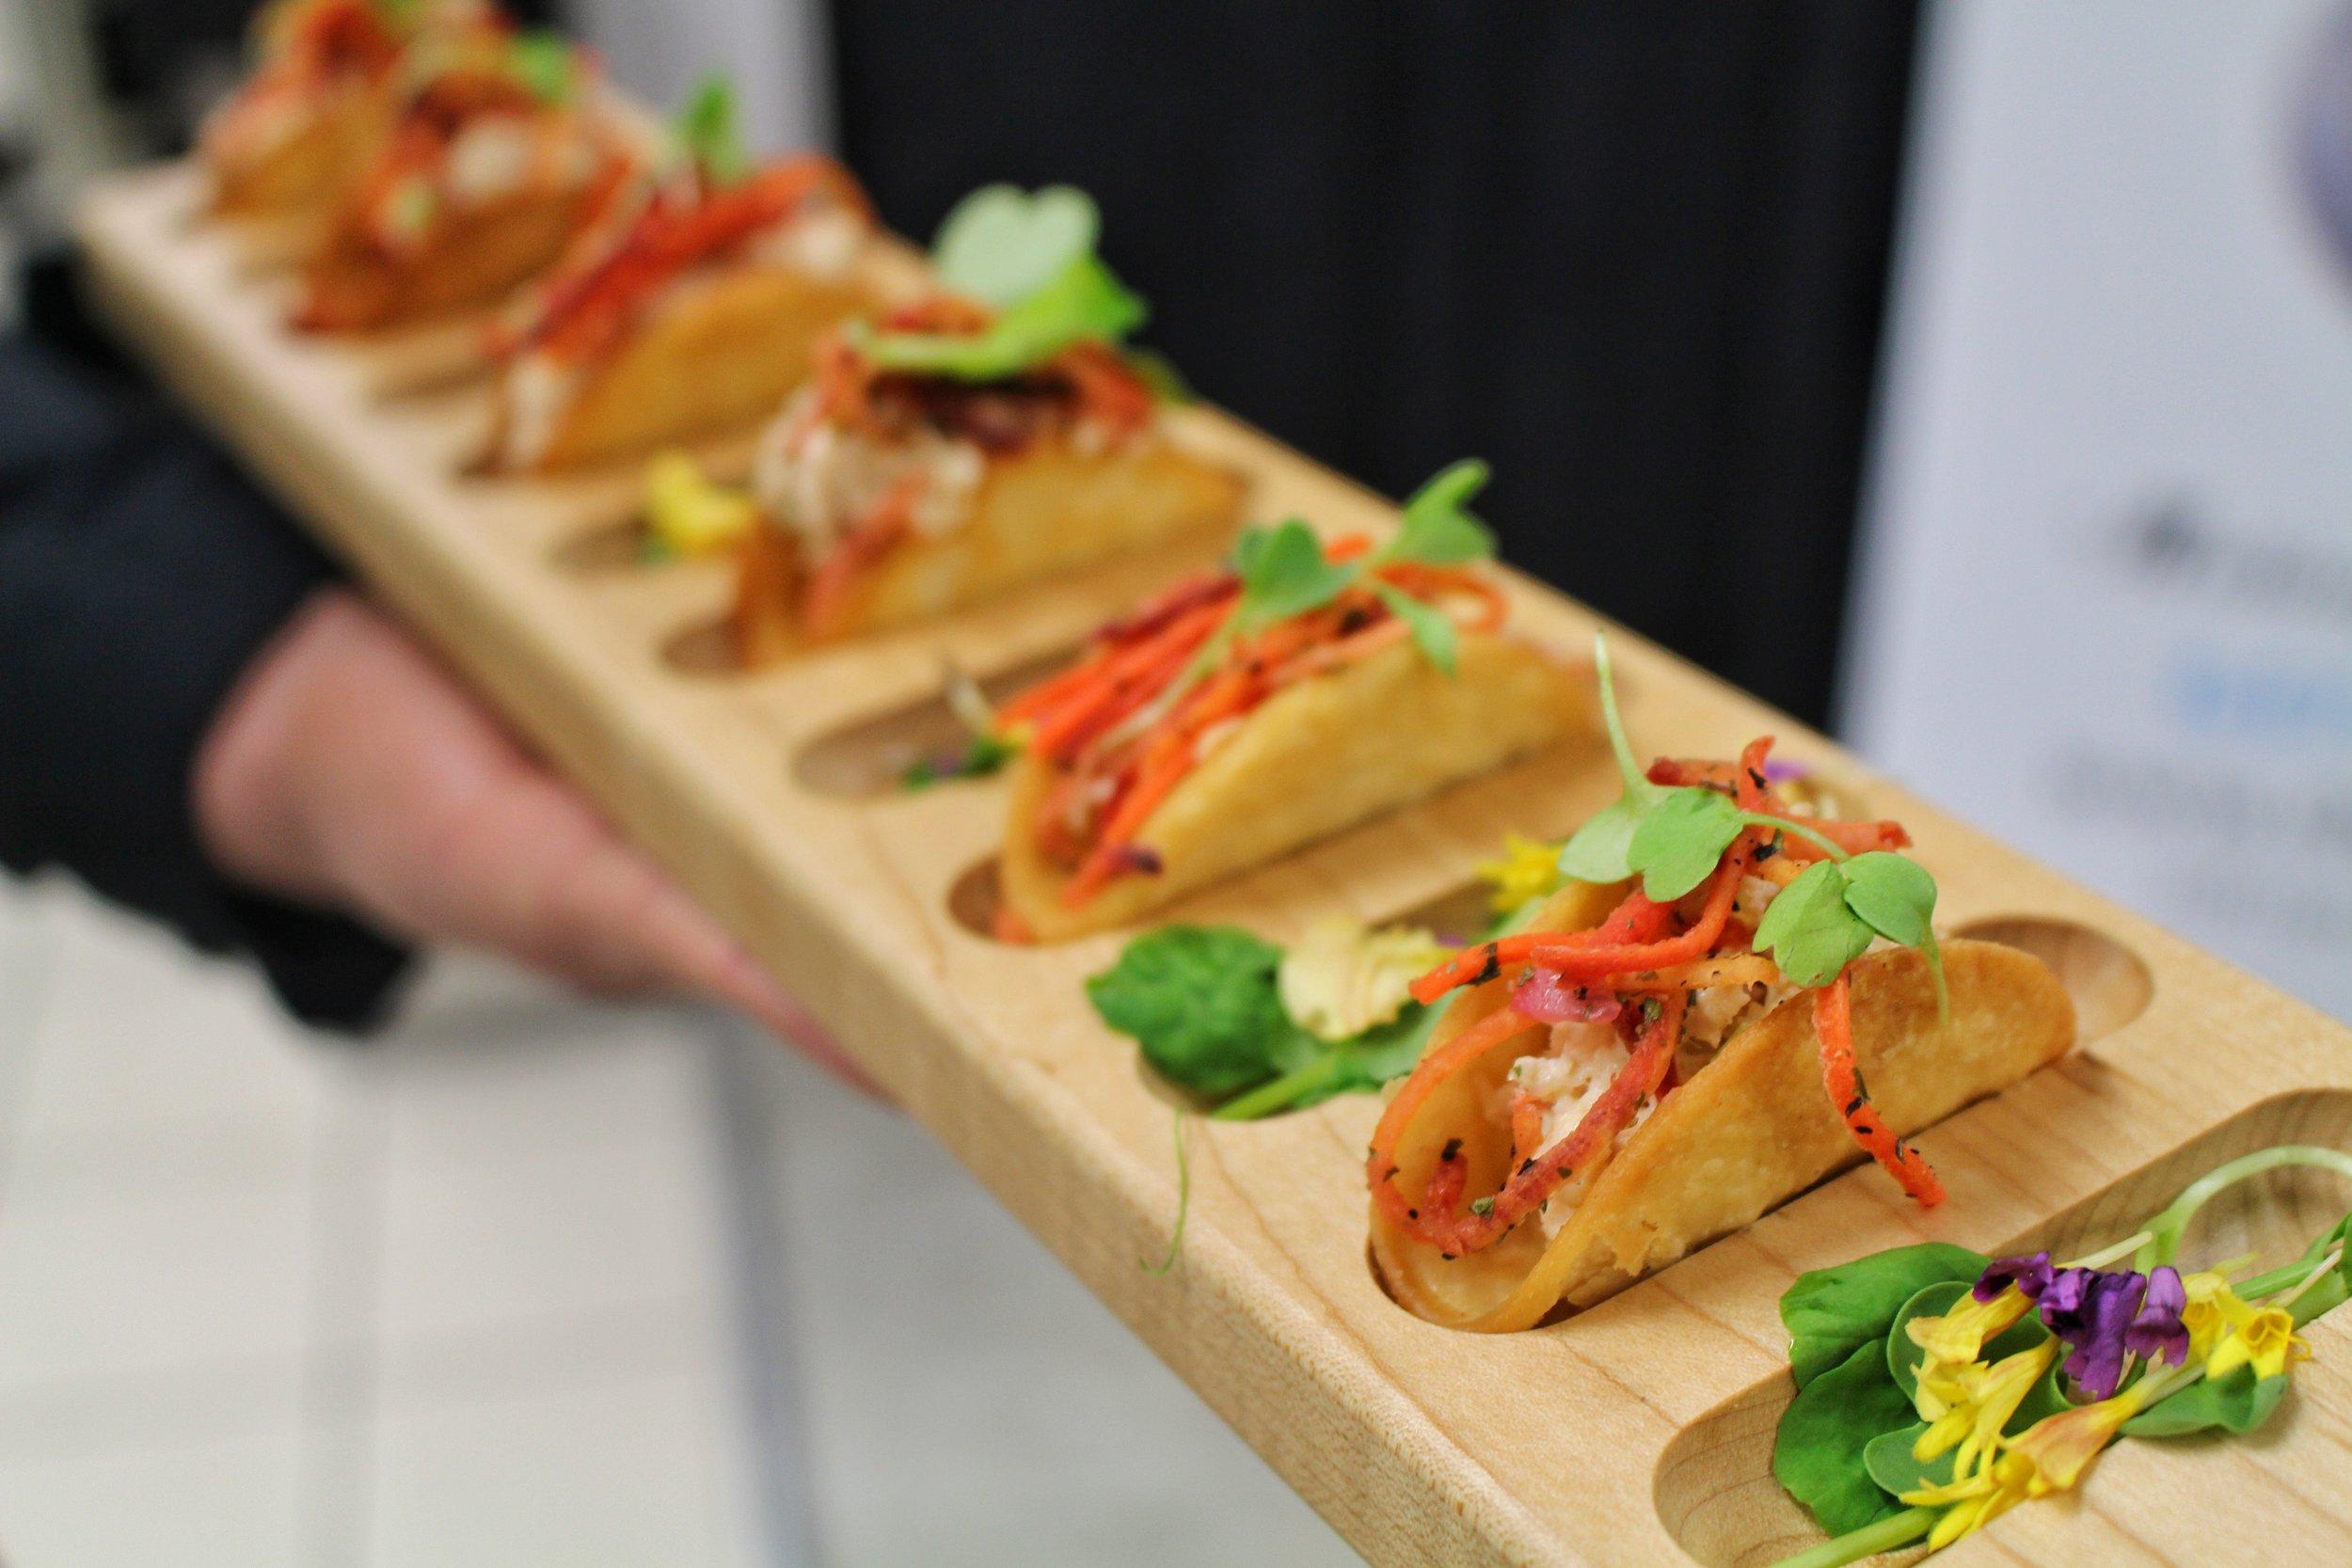 Mini lobster Taco's with a Kewpie & Heirloom Carrot Slaw